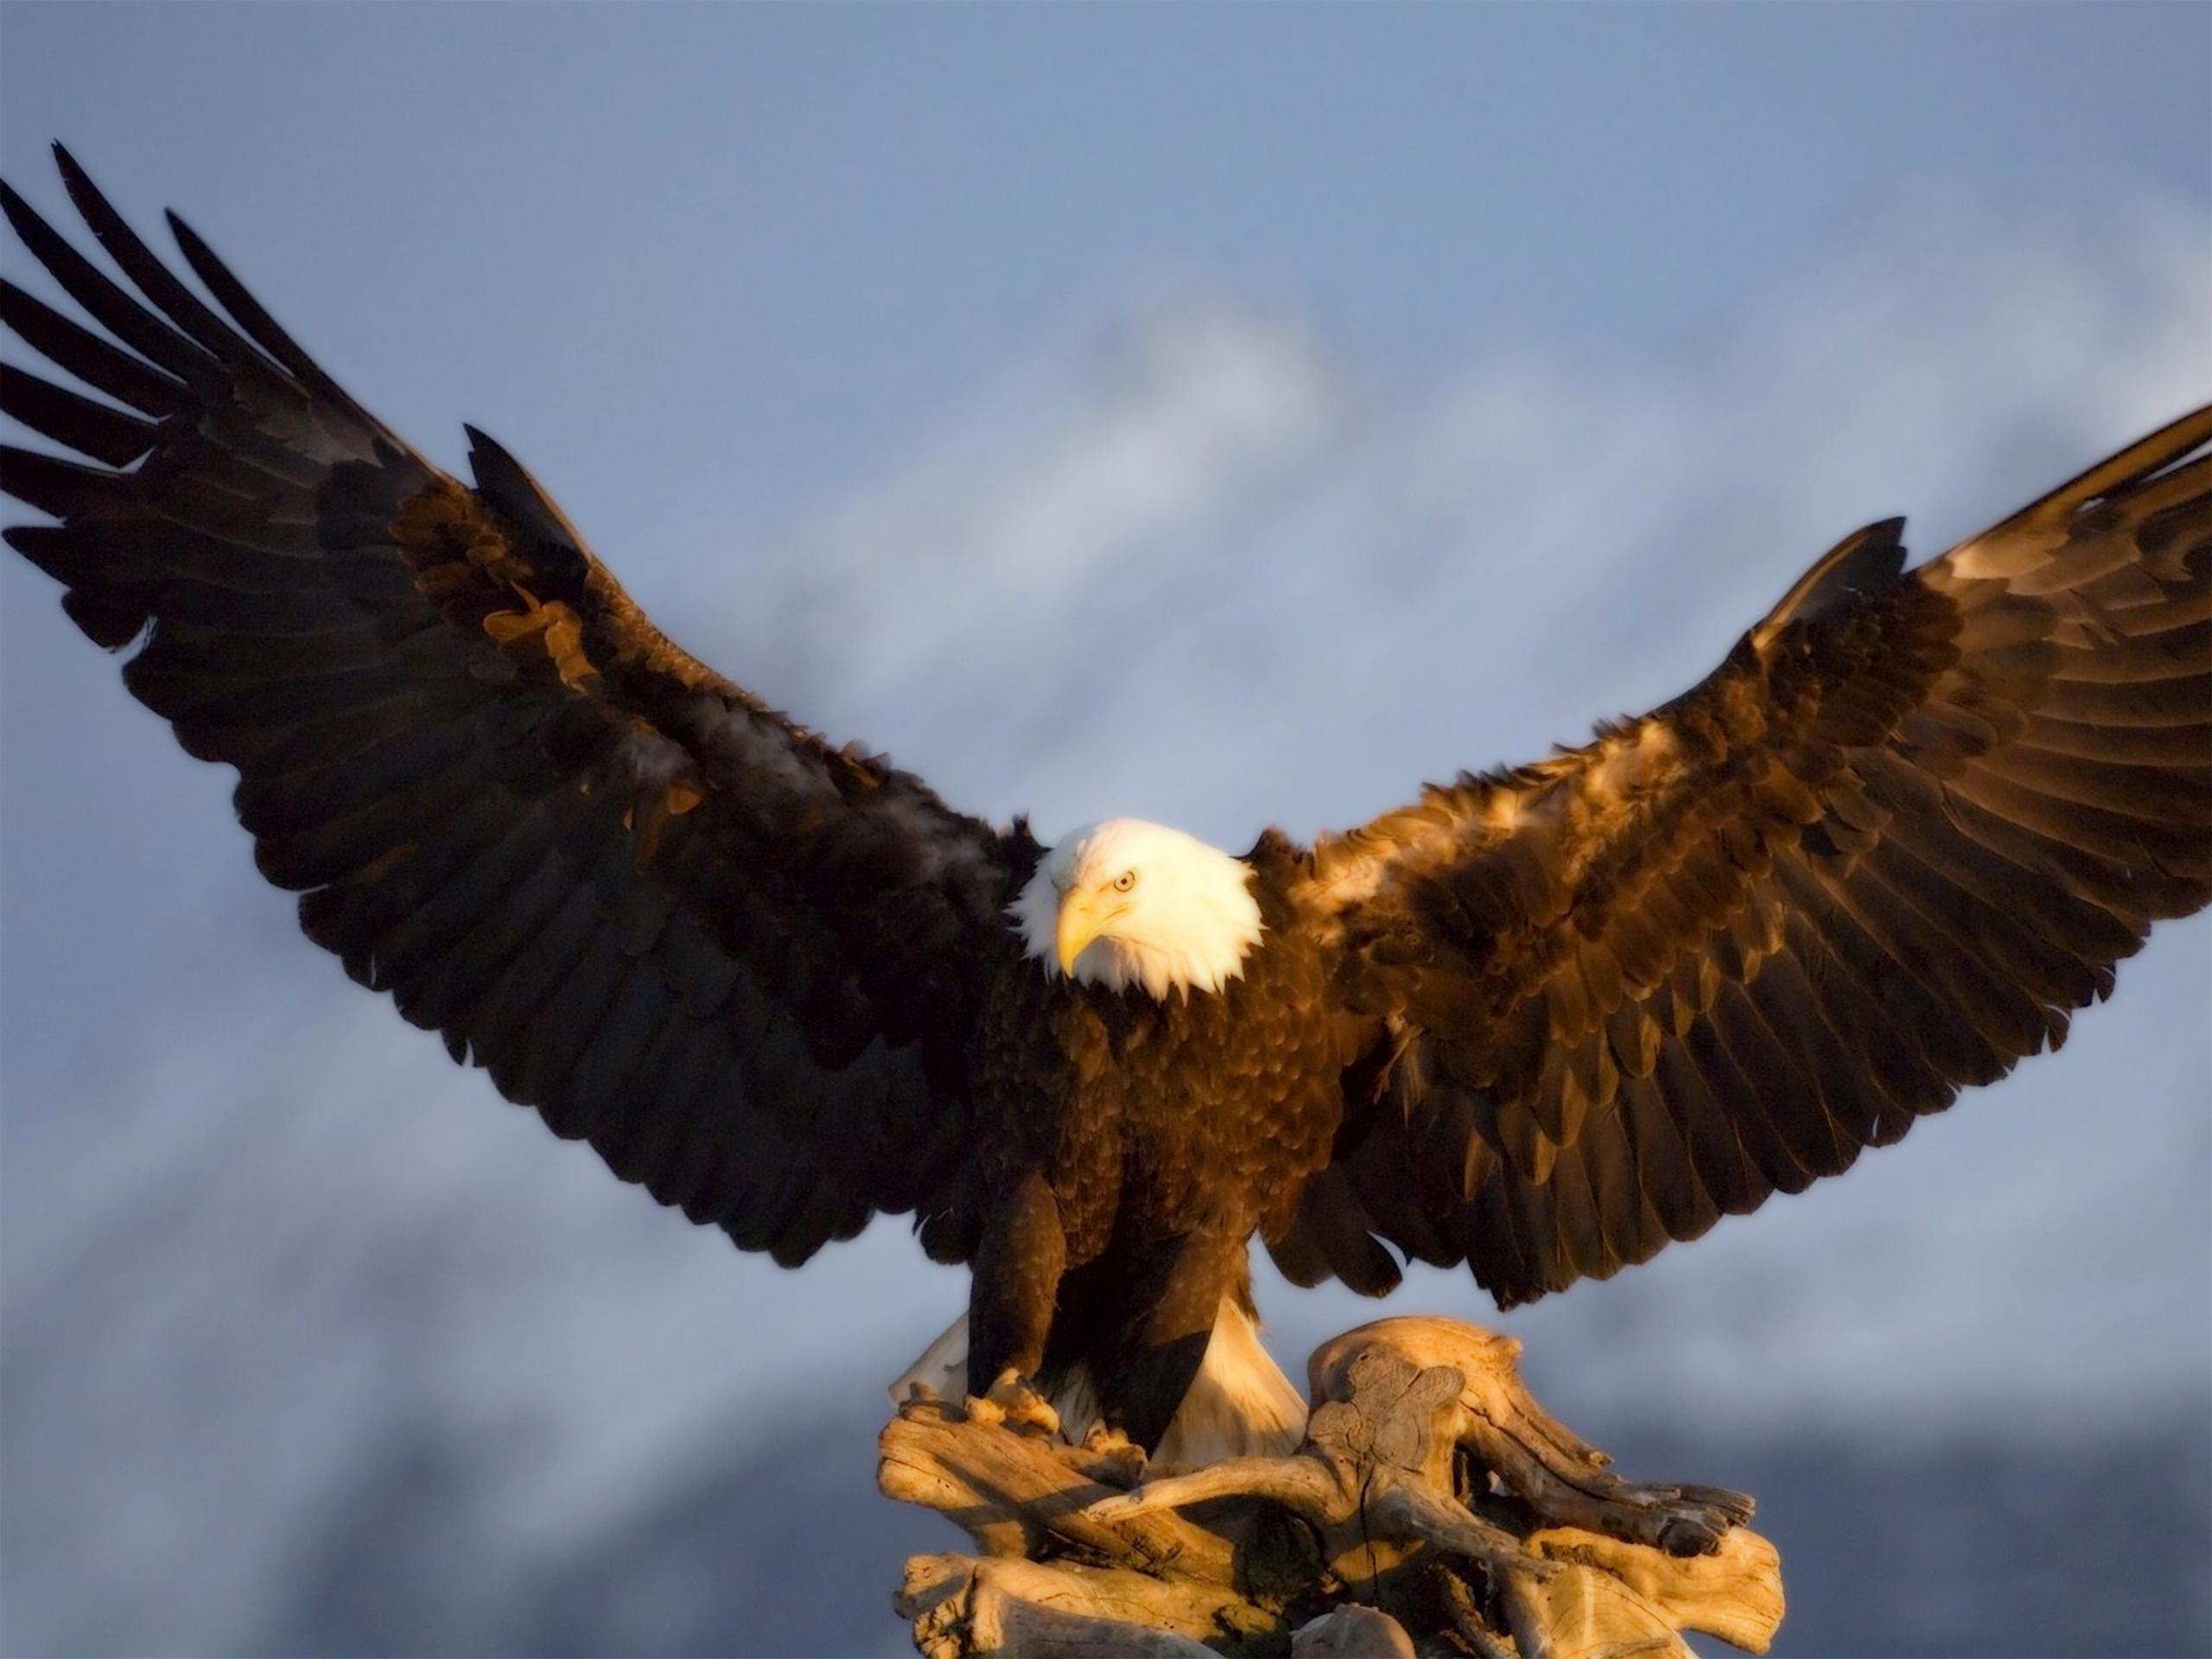 35+ Eagles Wallpapers HD Widescreen on WallpaperSafari